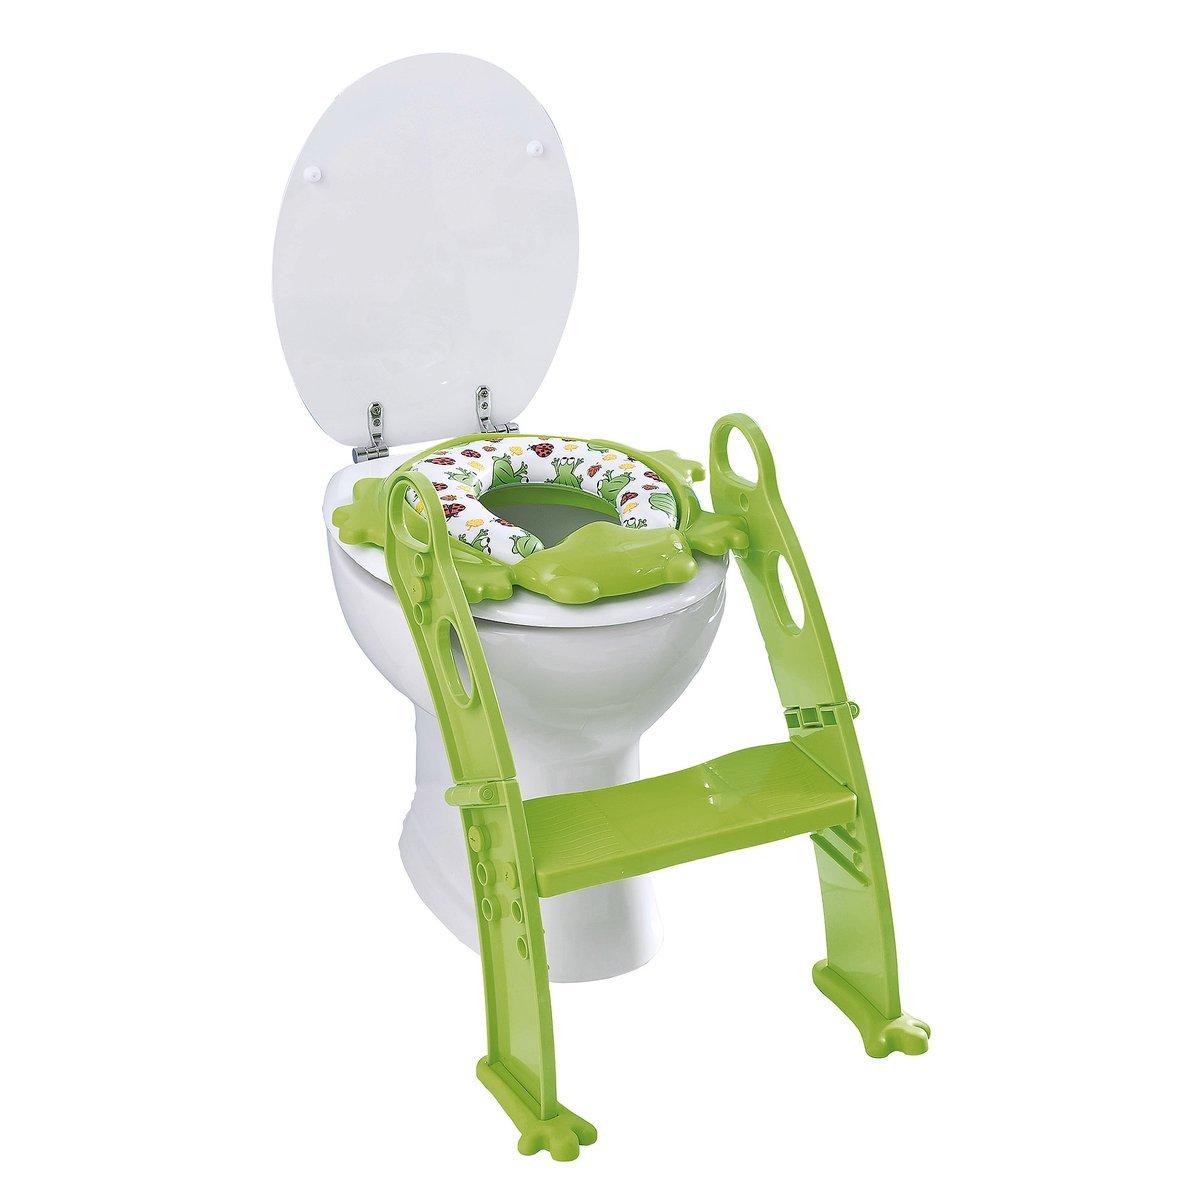 Toiletten-Trainer Frosch BABY-WALZ